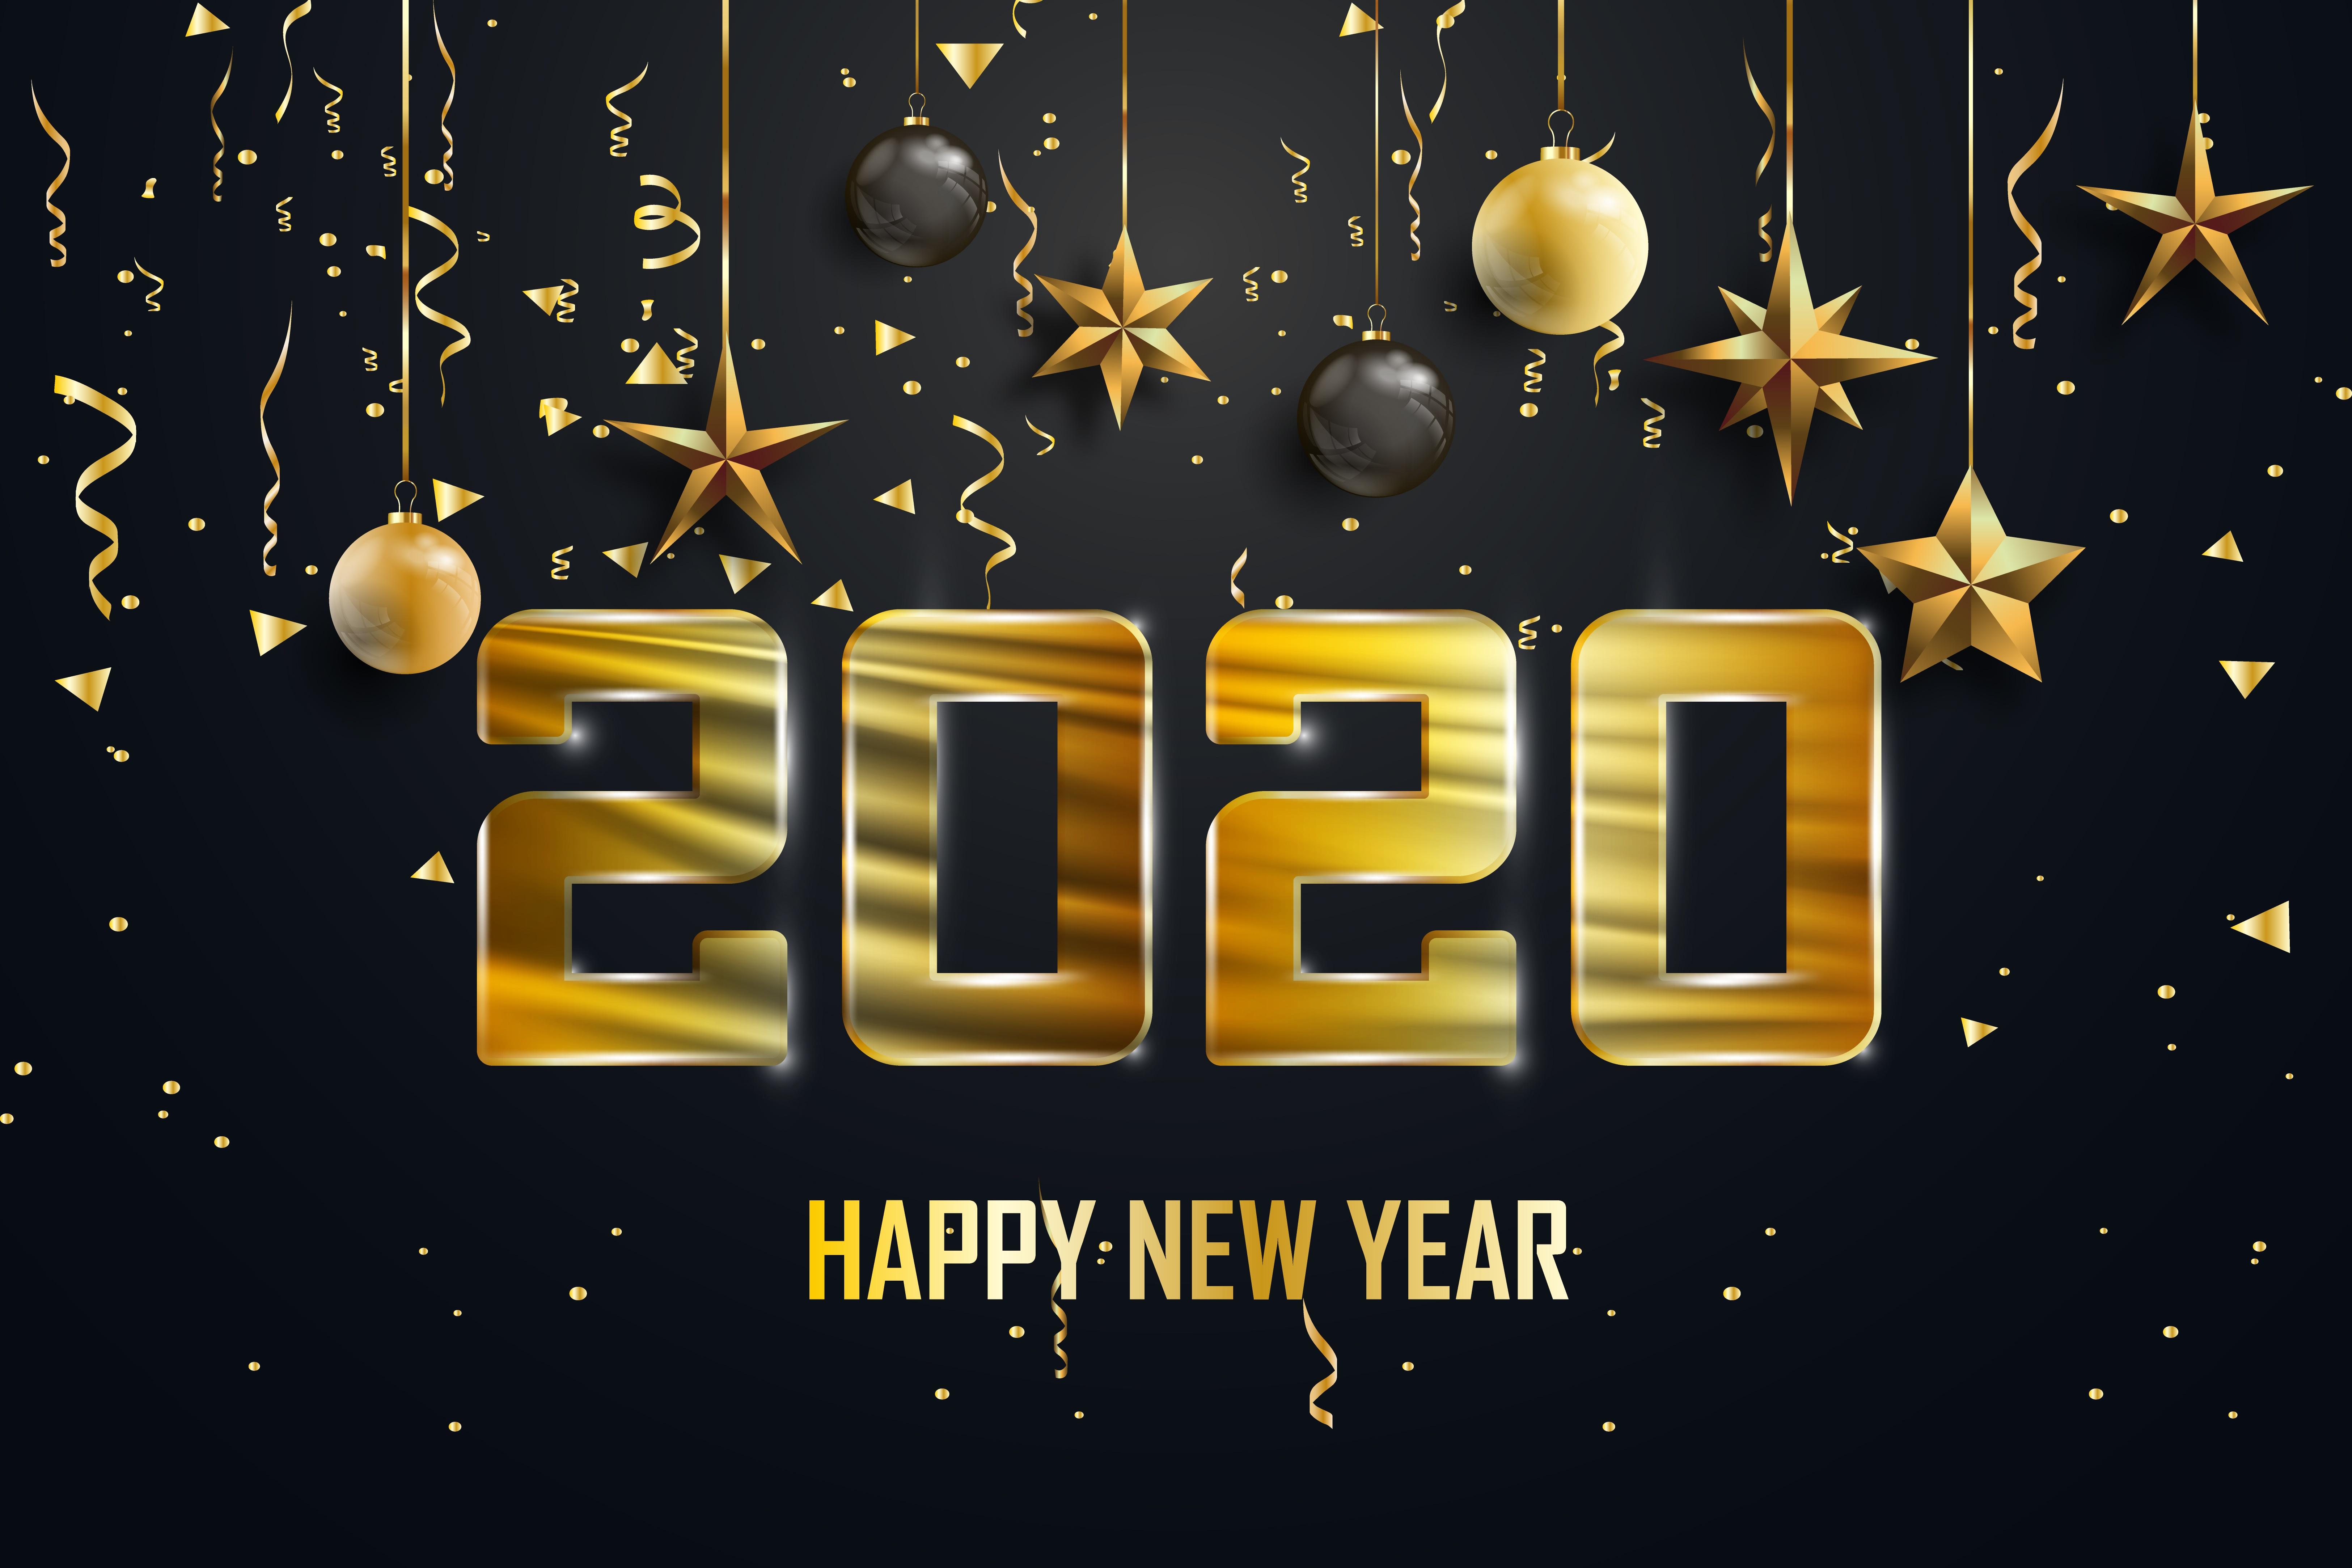 New Year 2020 5k Retina Ultra HD Wallpaper Background Image 6500x4333